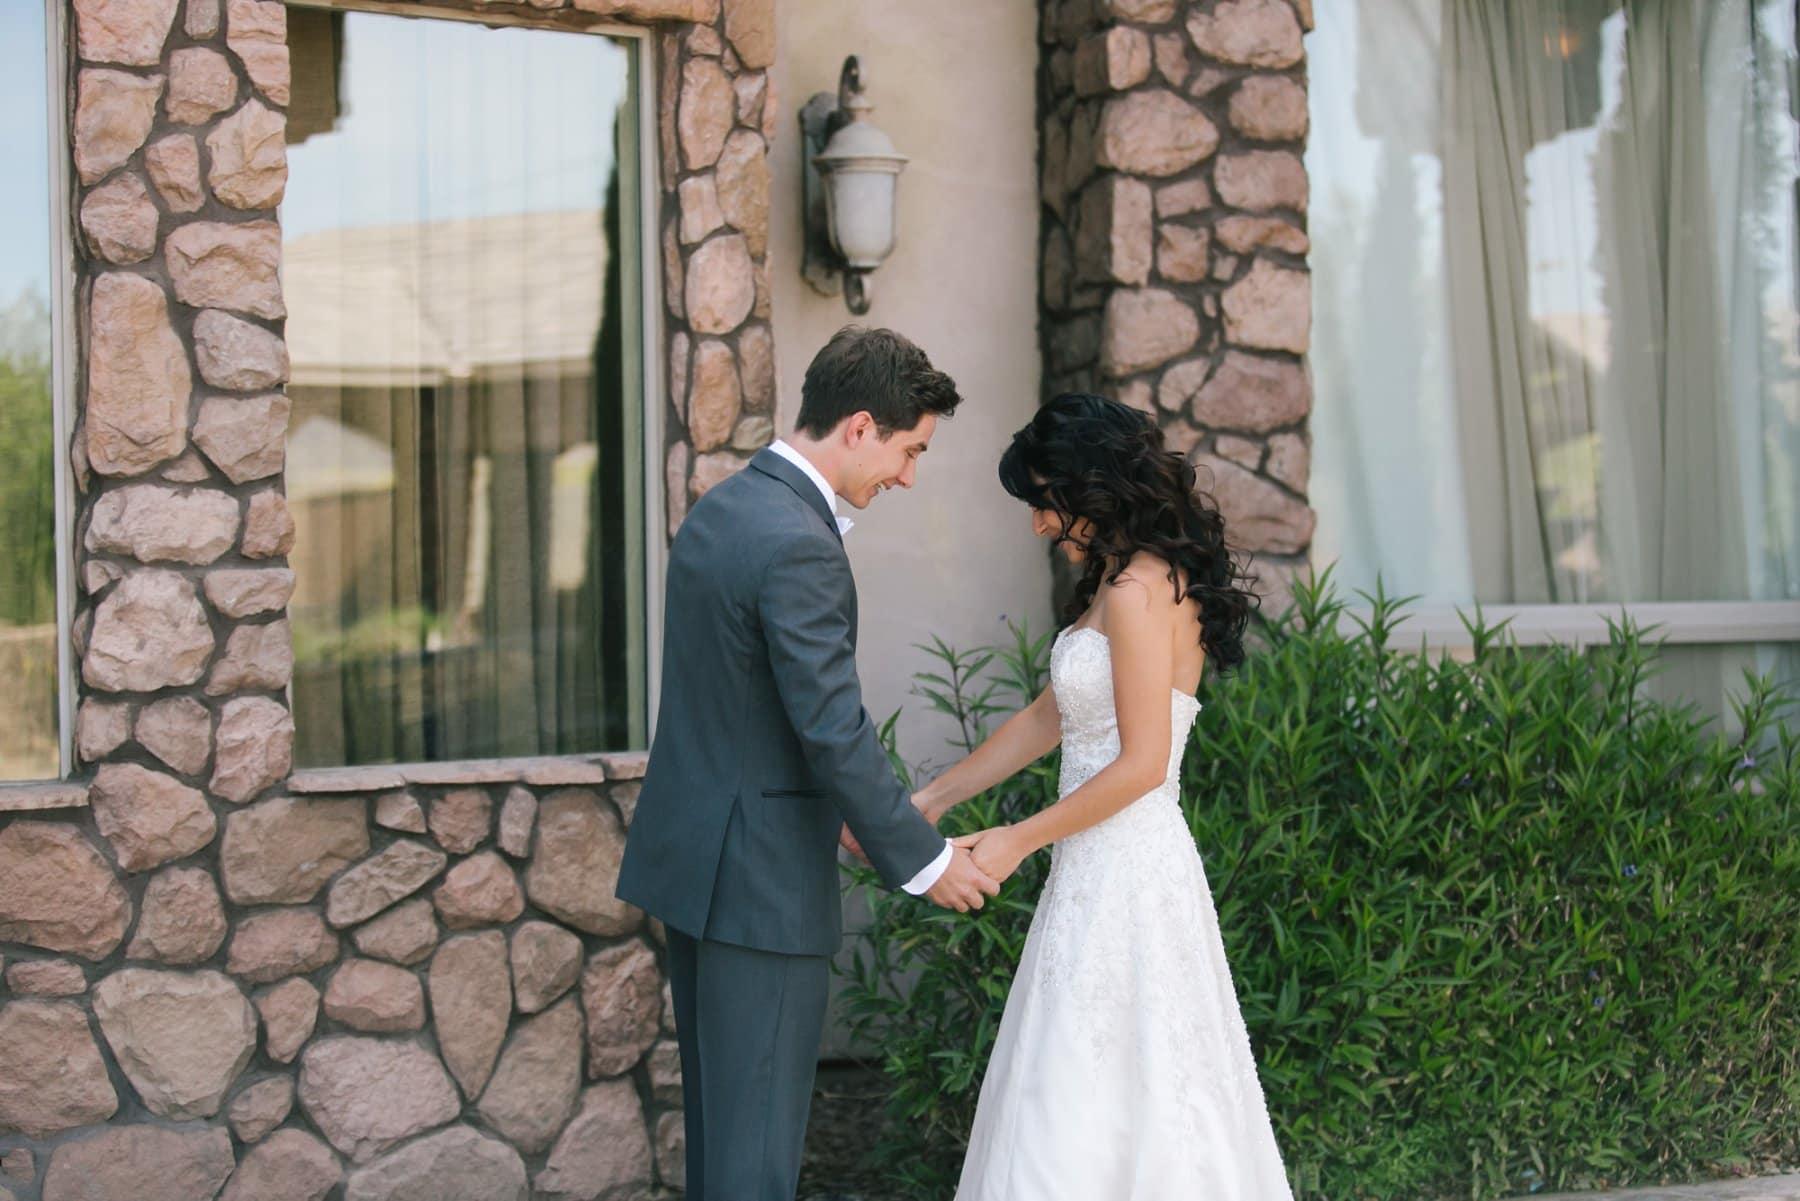 Superstition Manor wedding bride & groom first look